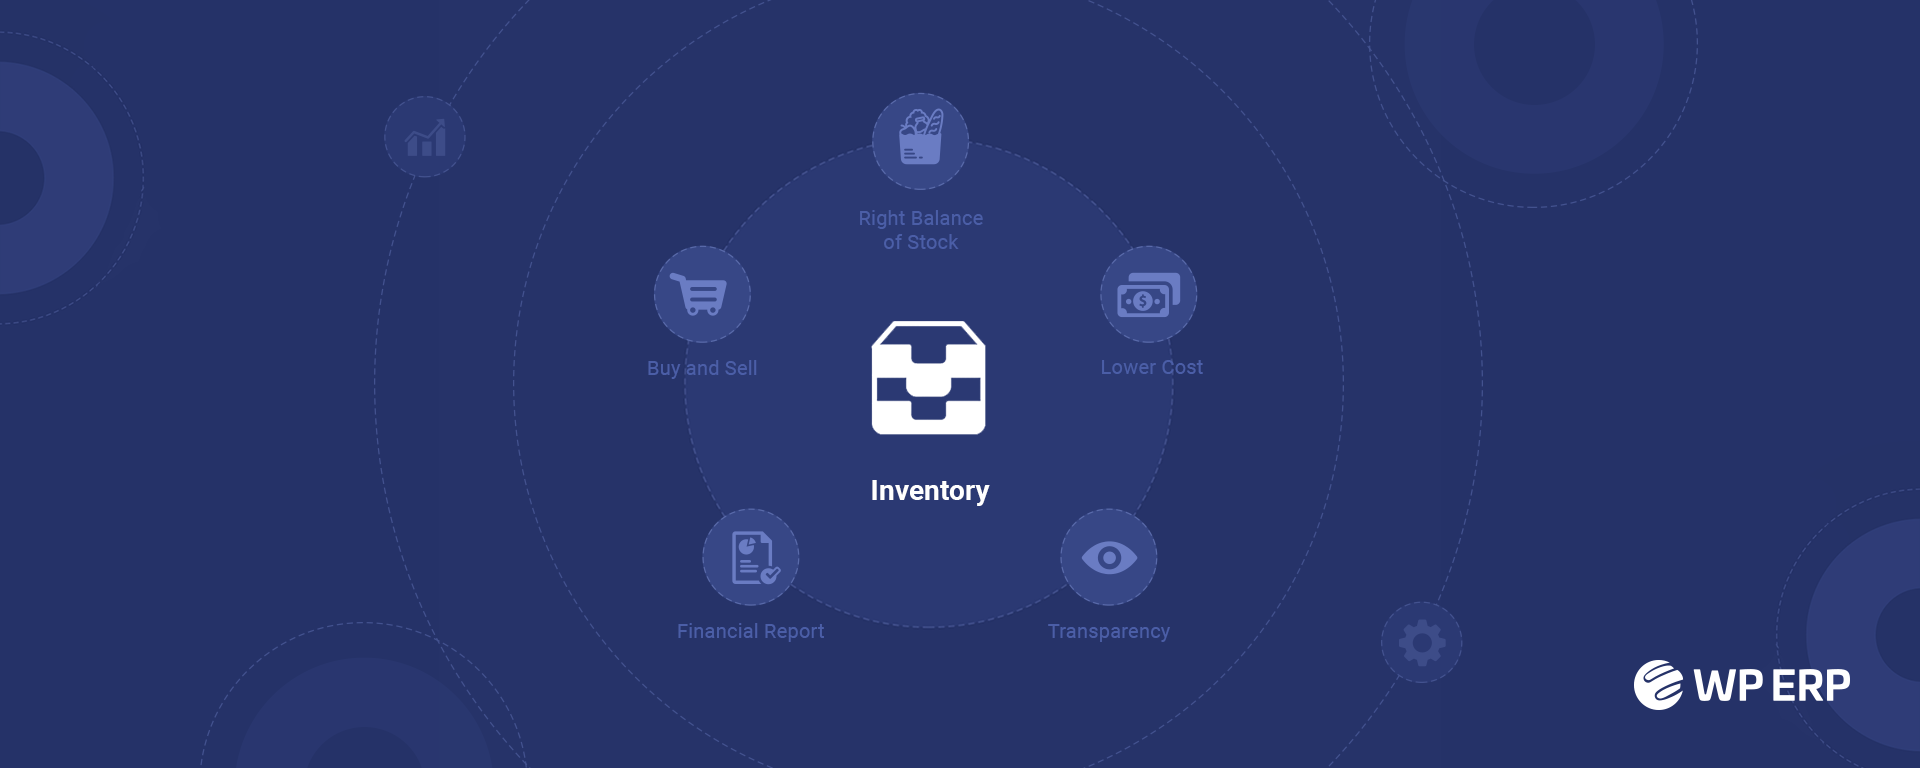 Manage Stocks Using the WordPress Inventory Management Plugin